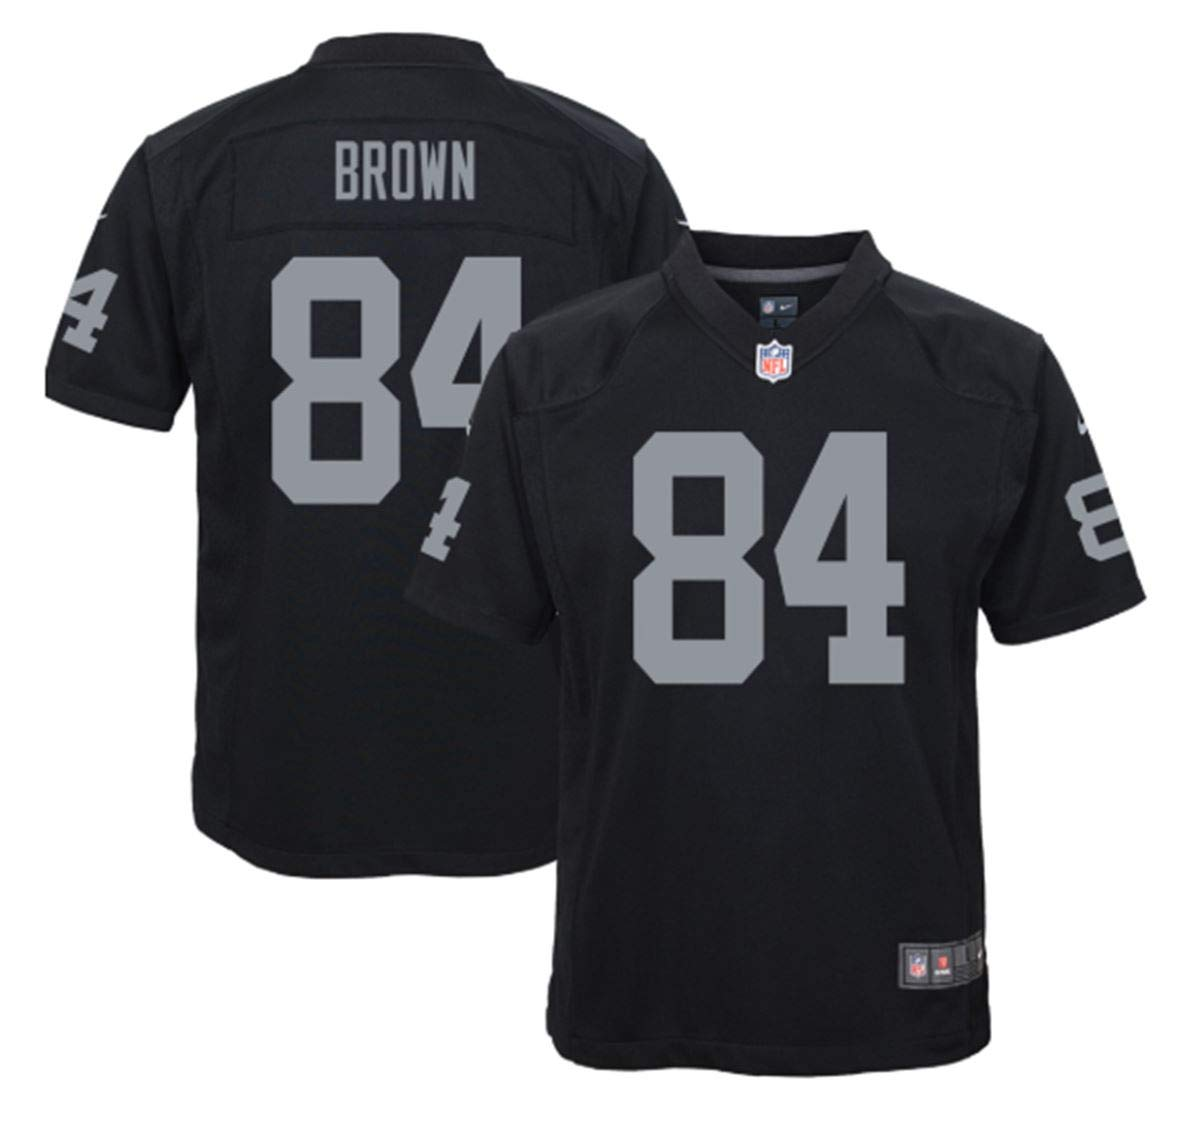 watch 3a123 65c77 Amazon.com : Nike Antonio Brown Oakland Raiders Youth Team ...